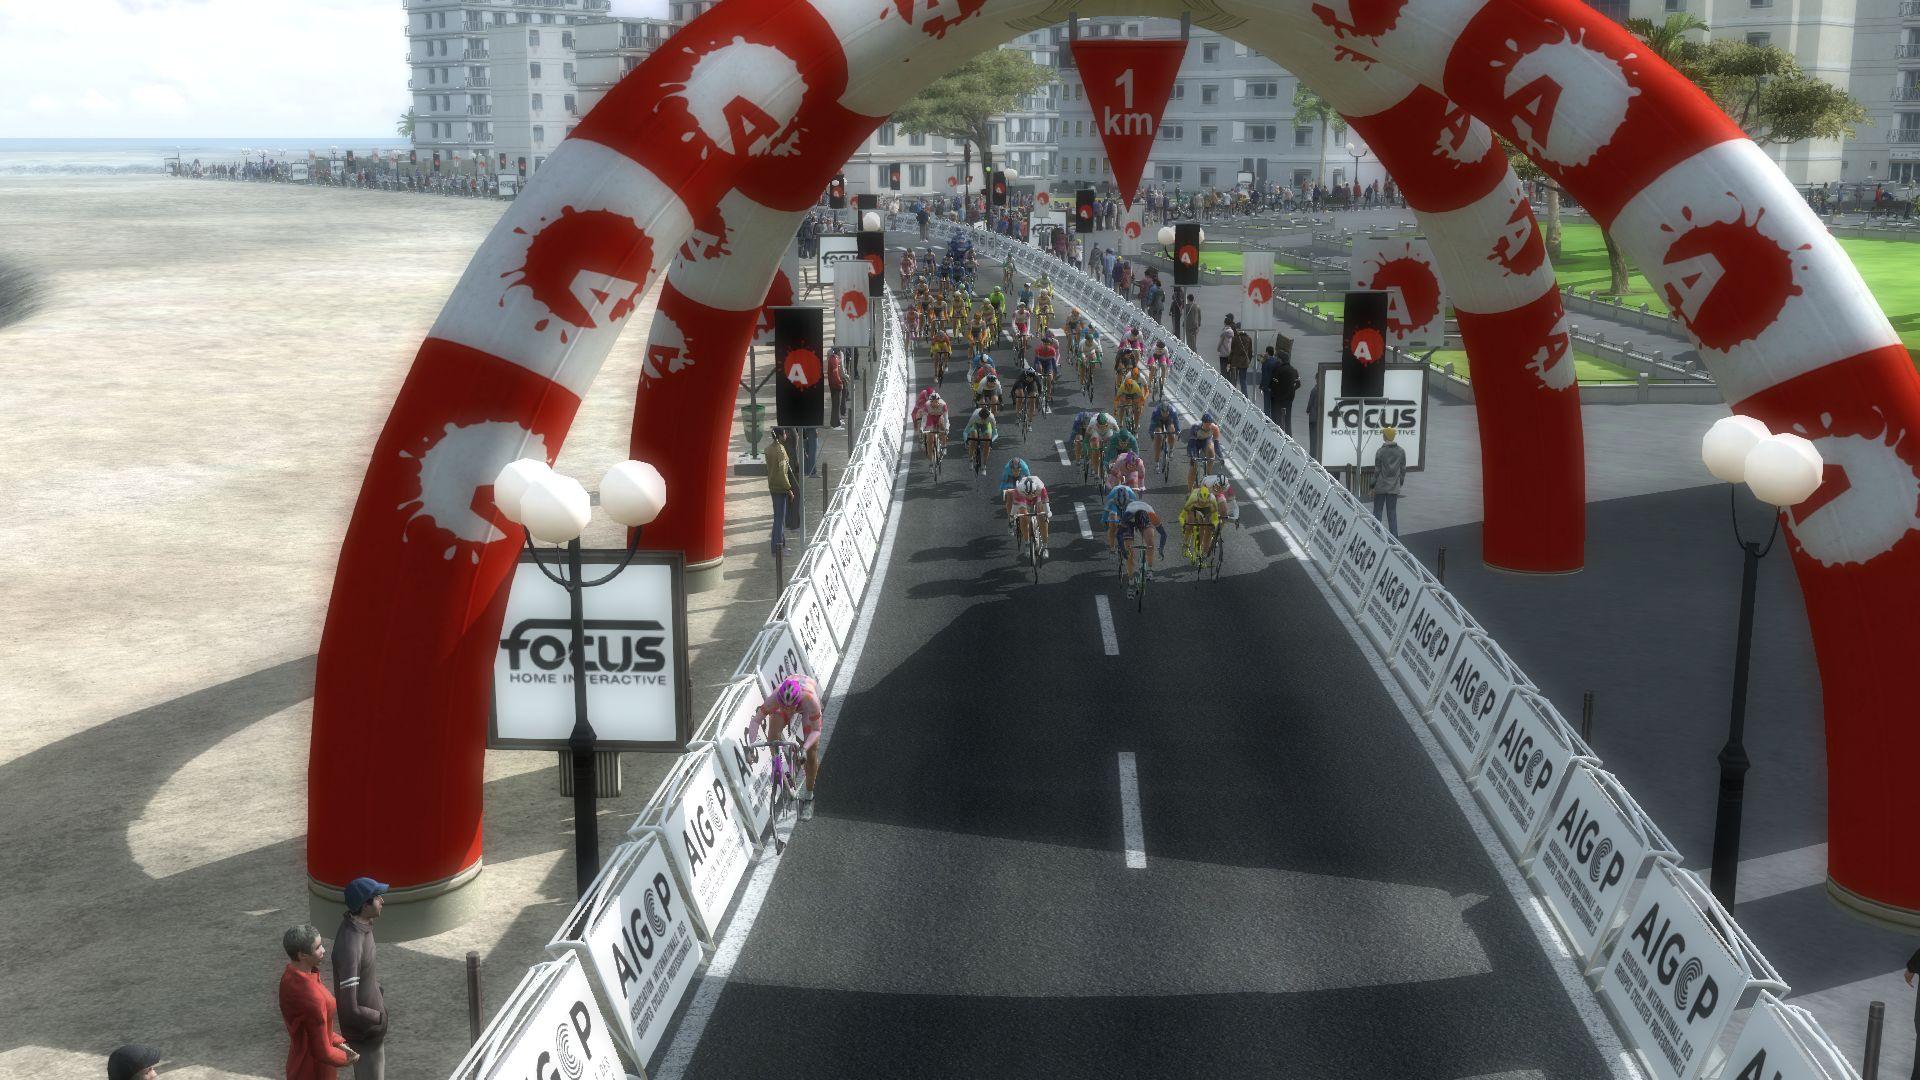 pcmdaily.com/images/mg/2019/Races/PT/Qatar/mg19_qat_s05_13.jpg